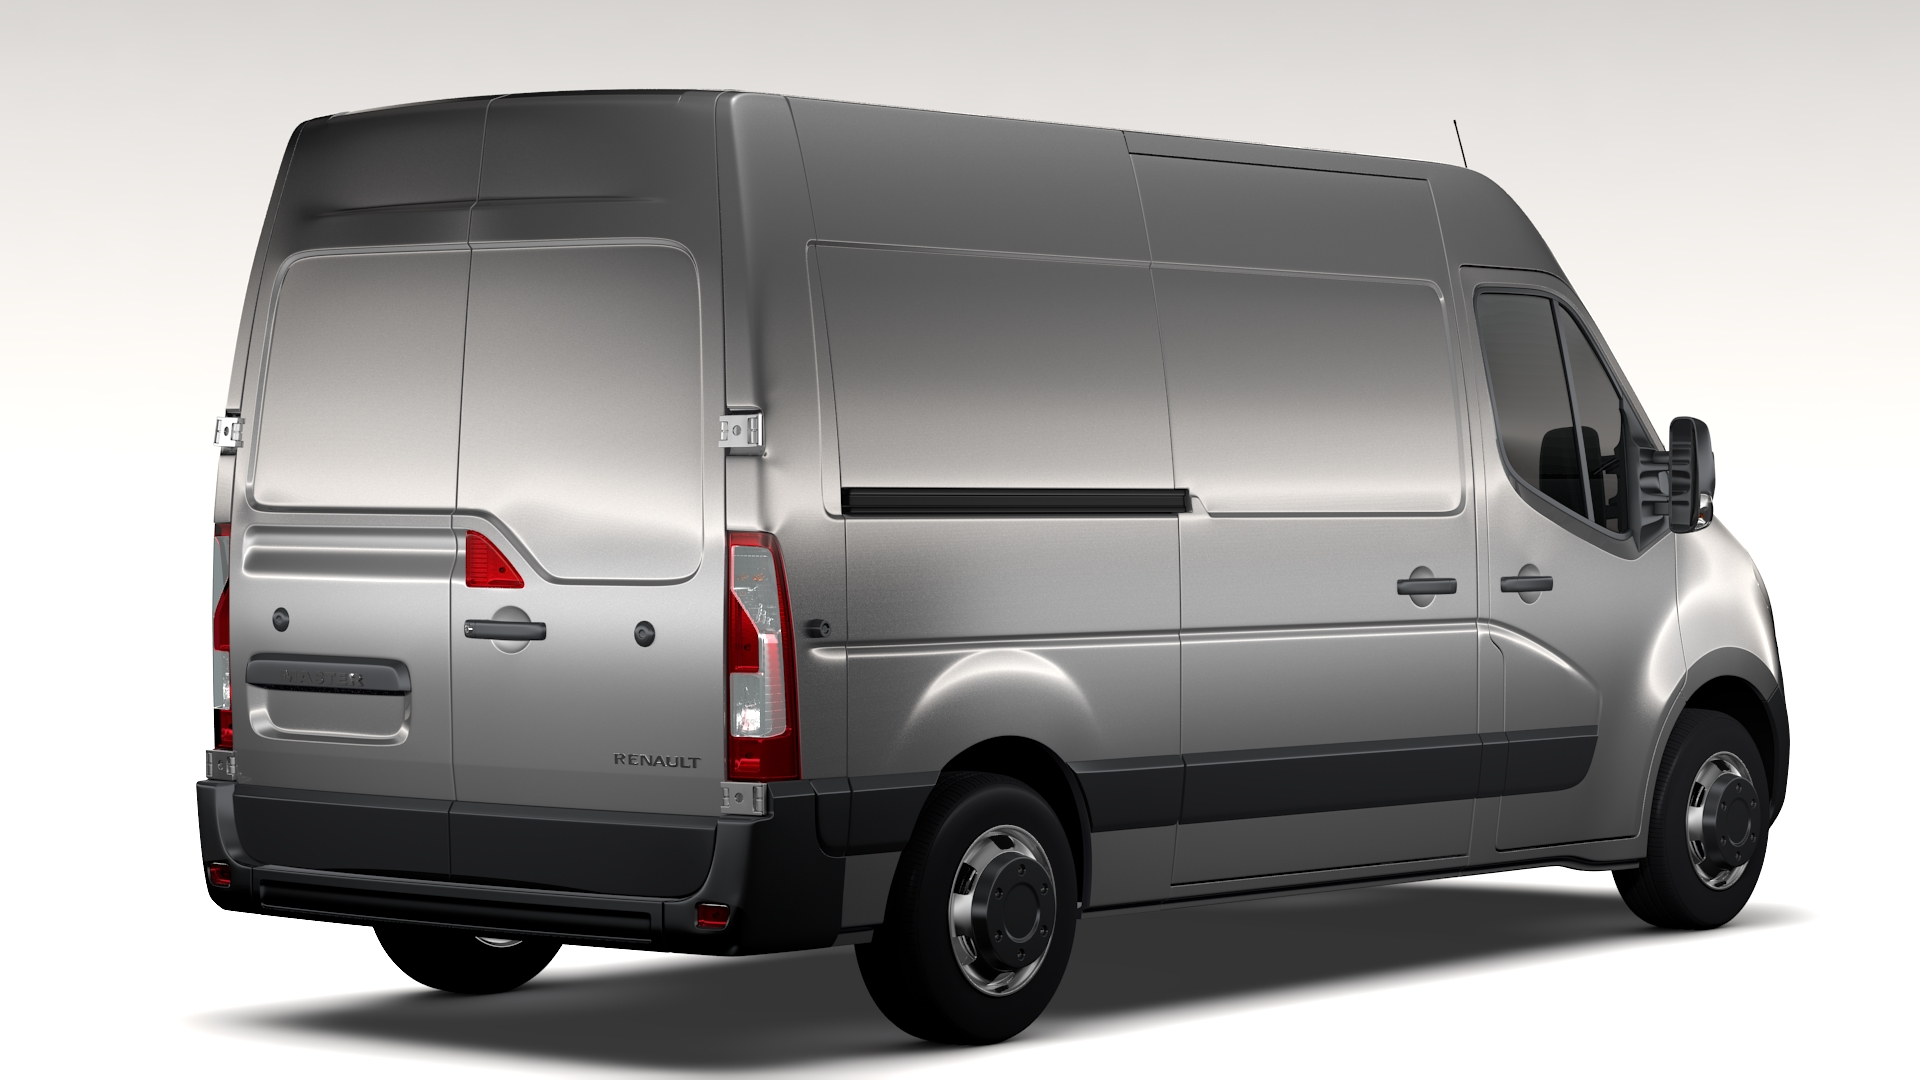 renault meistars l2h2 van 2010 3d modelis 3ds maks.